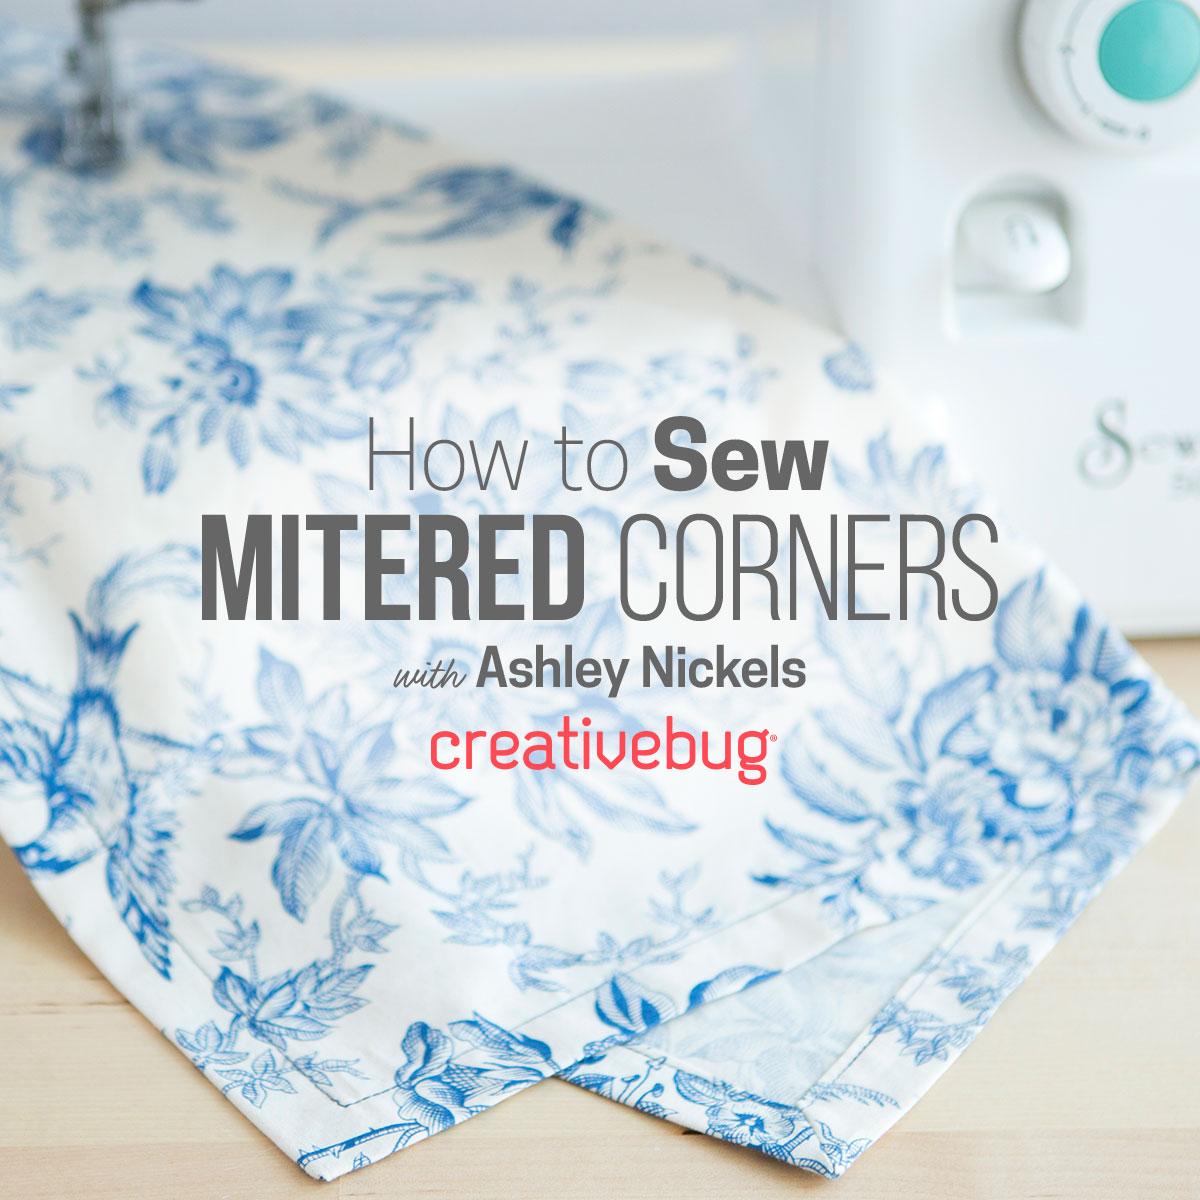 How to Miter Corners Creativebug